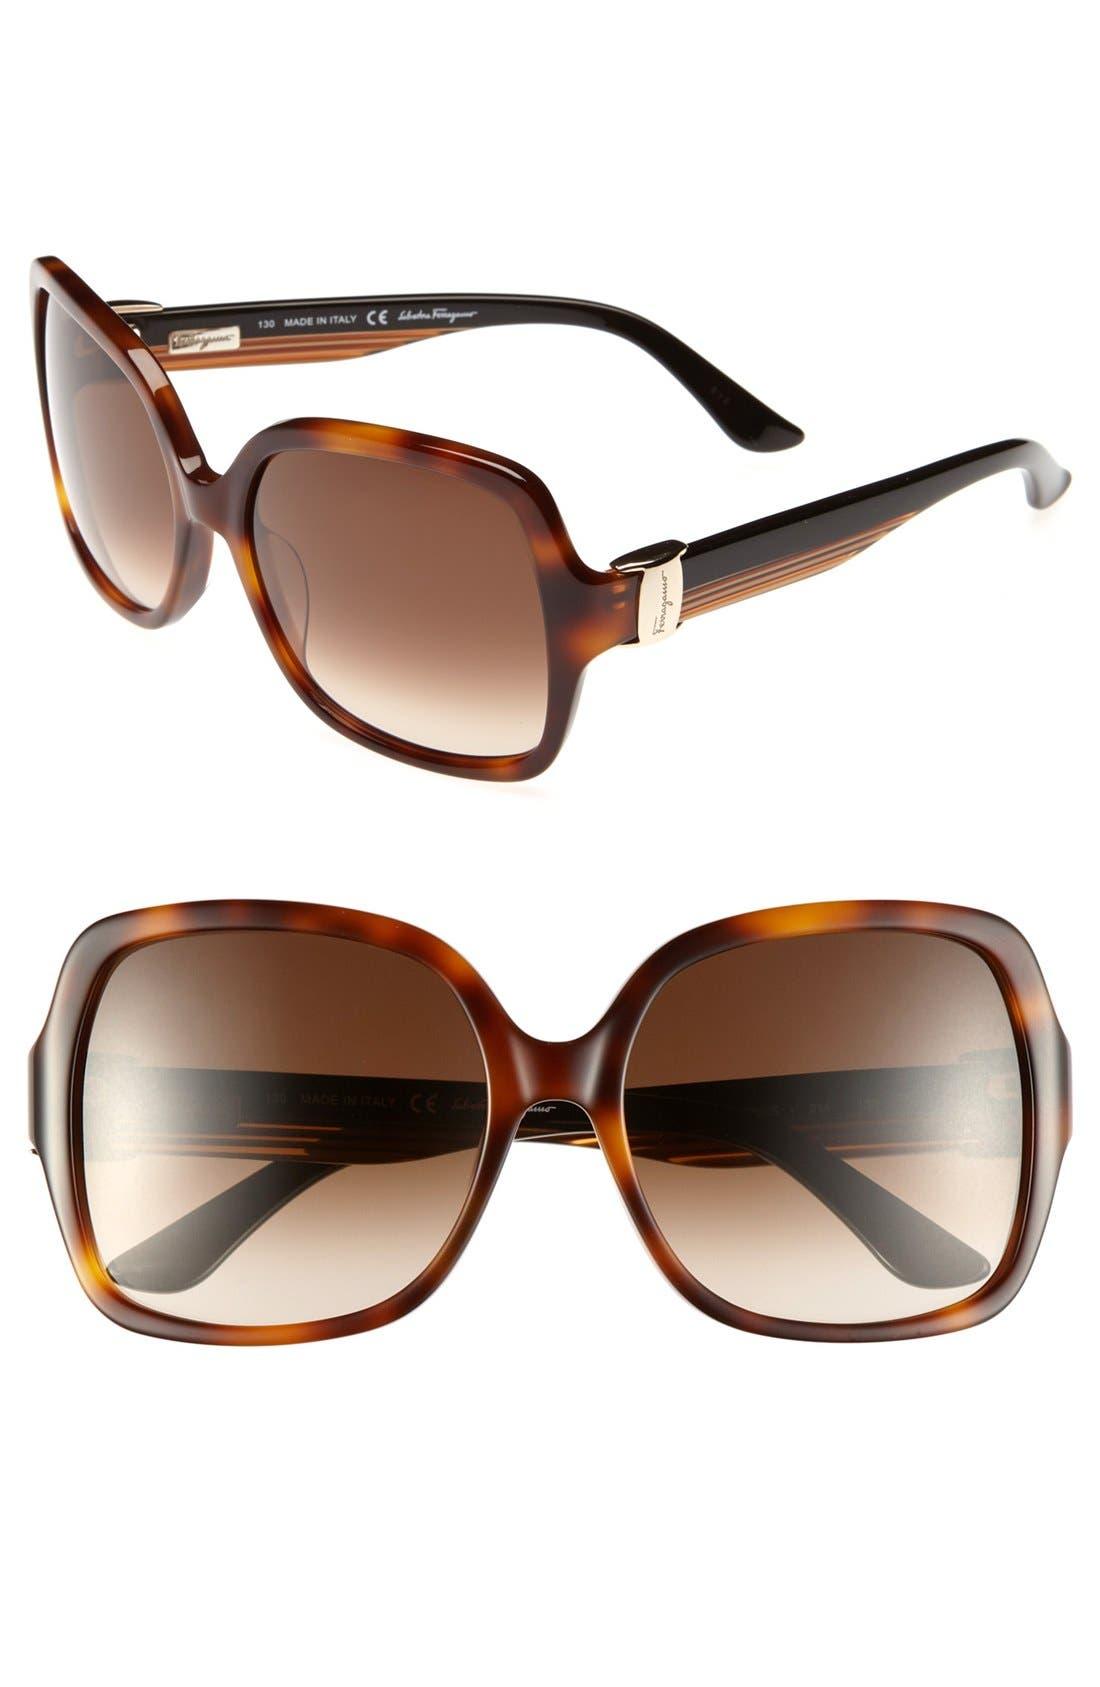 Alternate Image 1 Selected - Salvatore Ferragamo 56mm Oversized Sunglasses